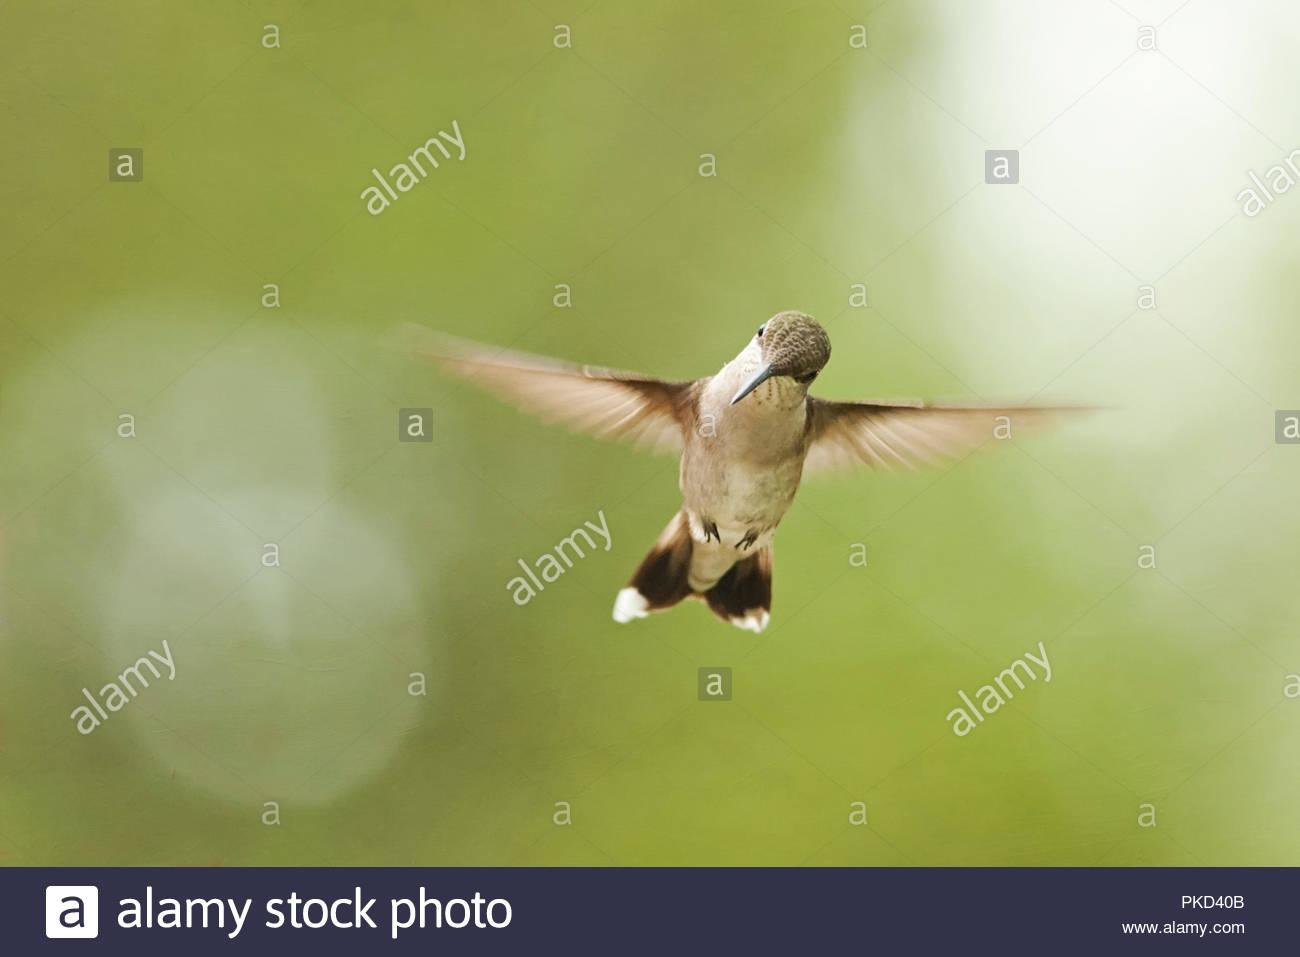 hummingbird with head tilted facing camera - Stock Image